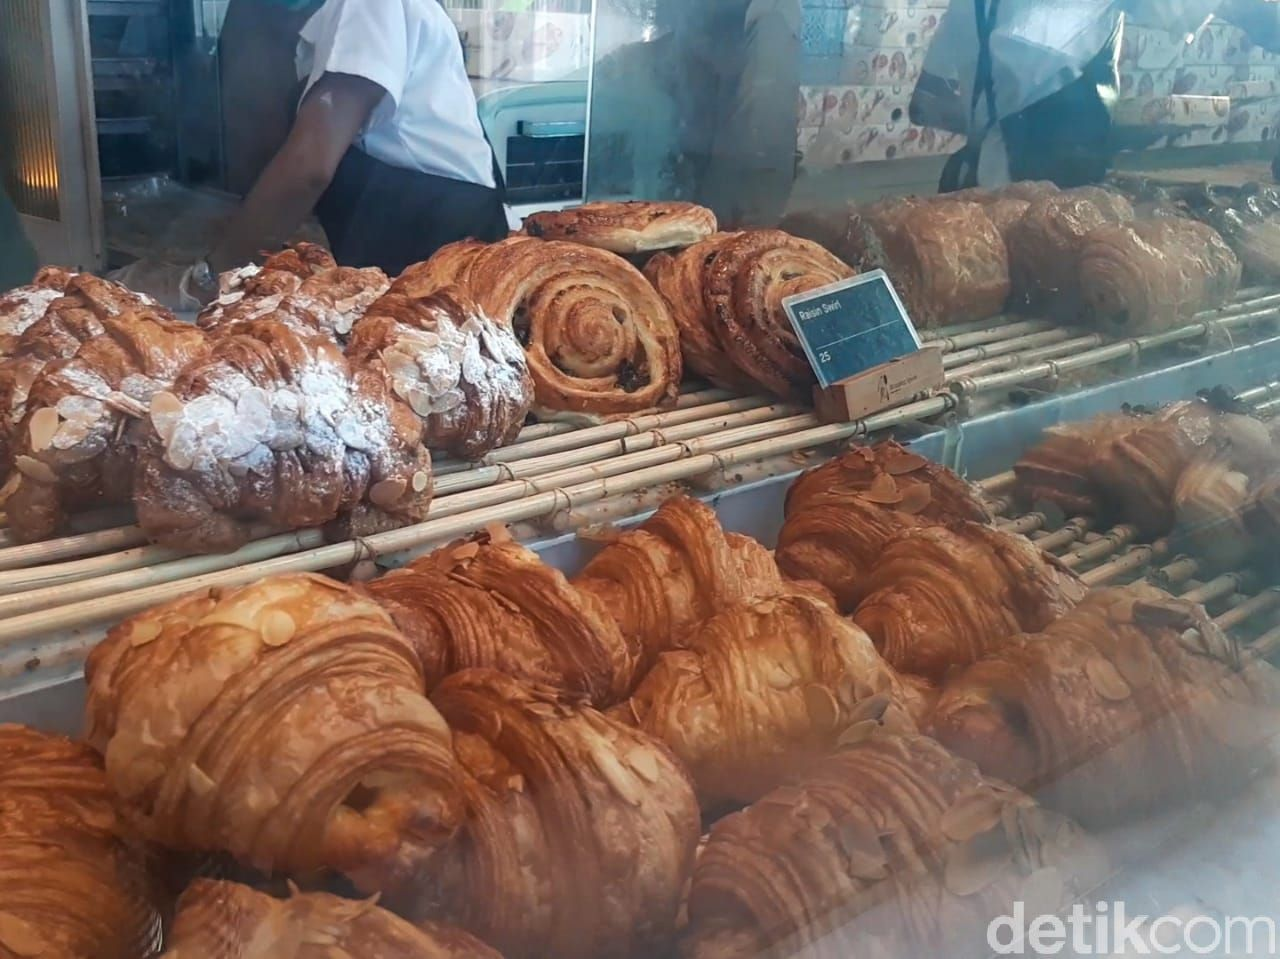 Monsieur Spoon buka di Jakarta. Berlokasi di Urban Farm PIK Unit 5. Menawarkan beragam croissant dan pastry khas Prancis yang enak.